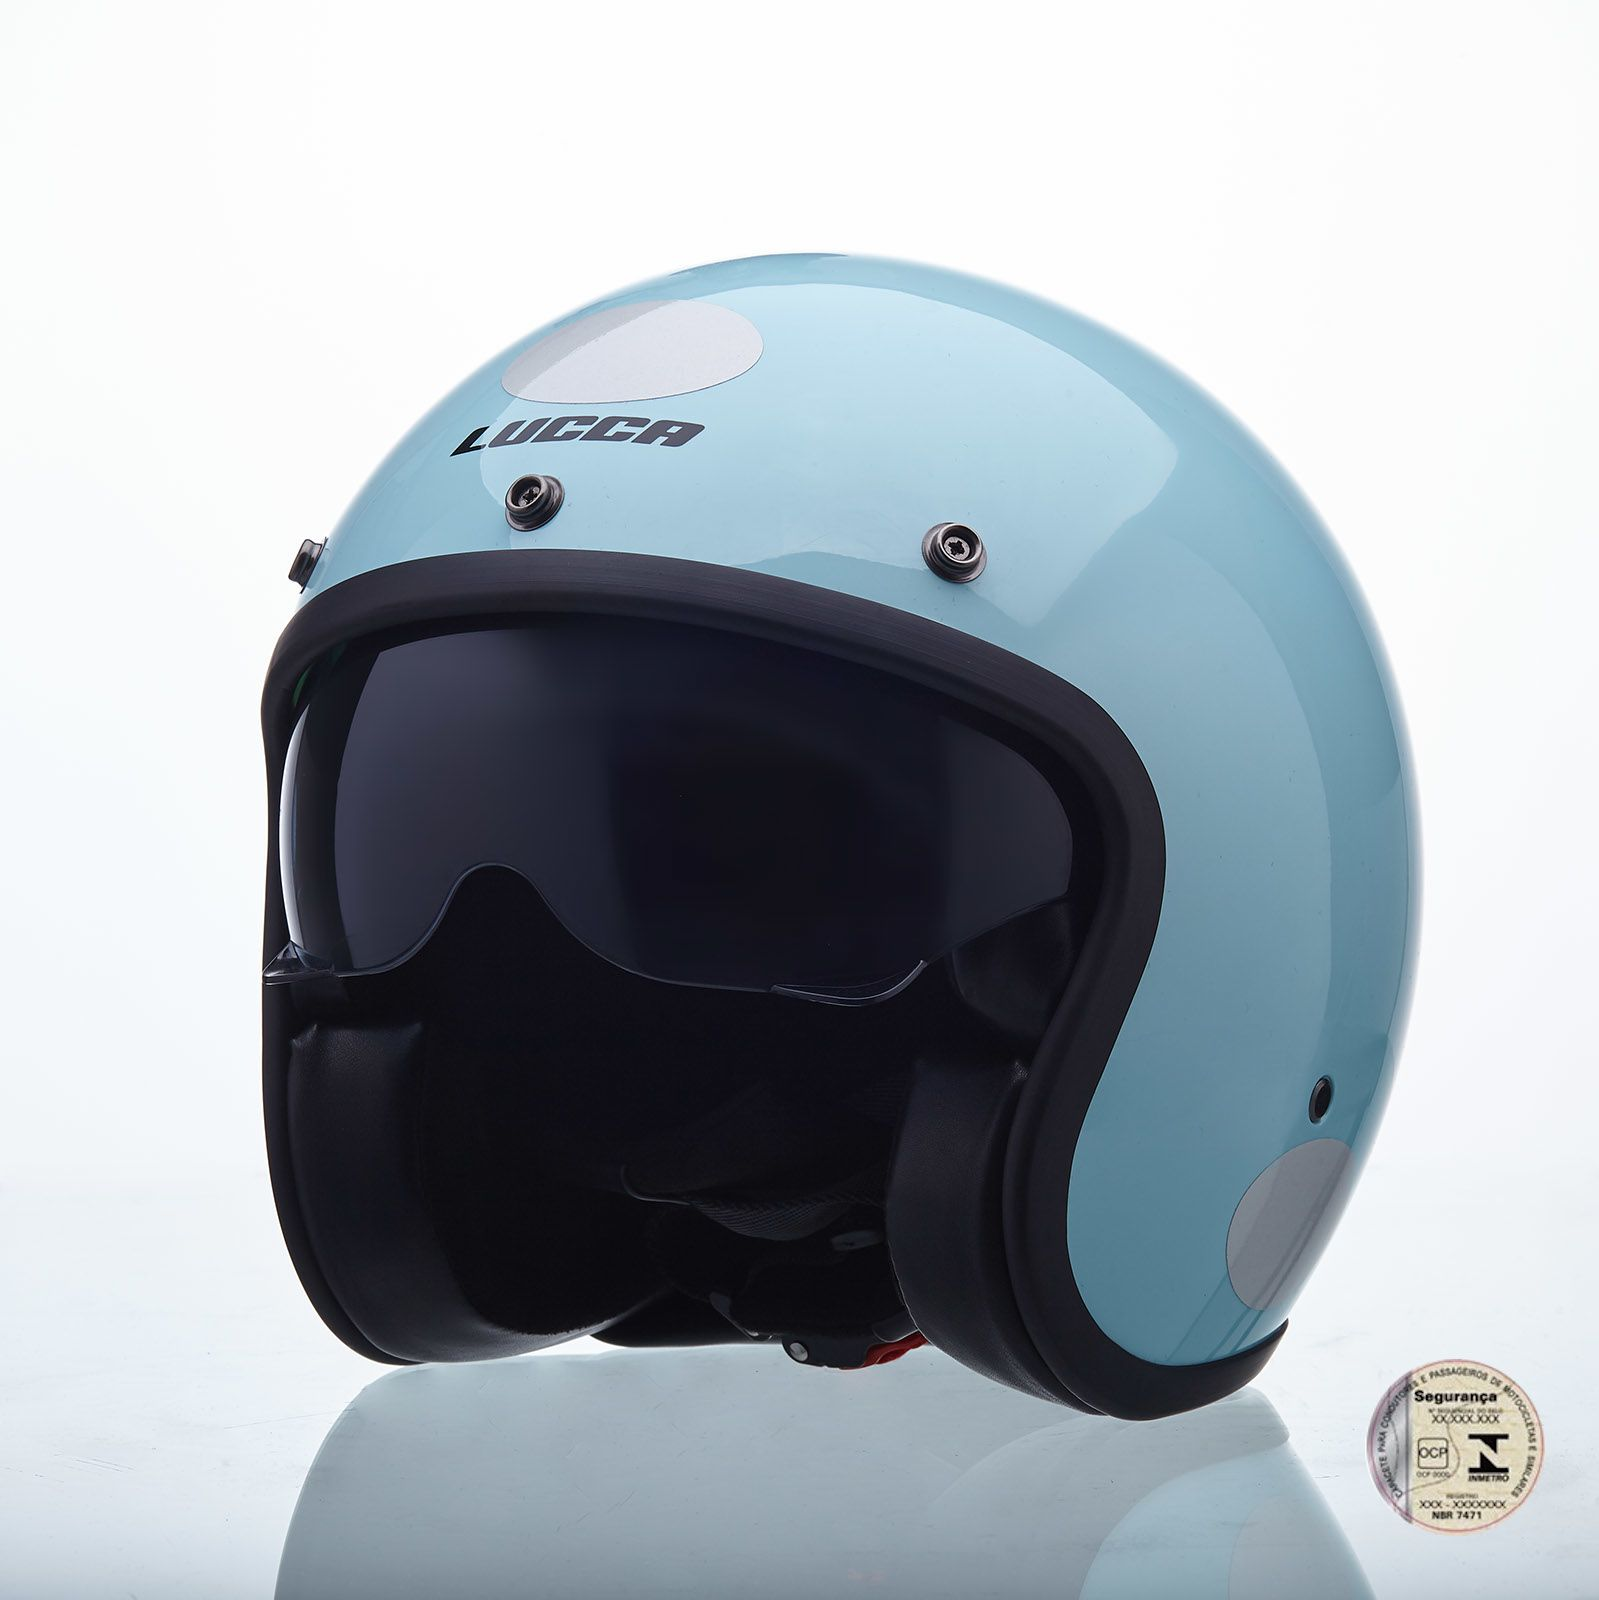 Capacete Lucca Customs Sublime Candy Blue